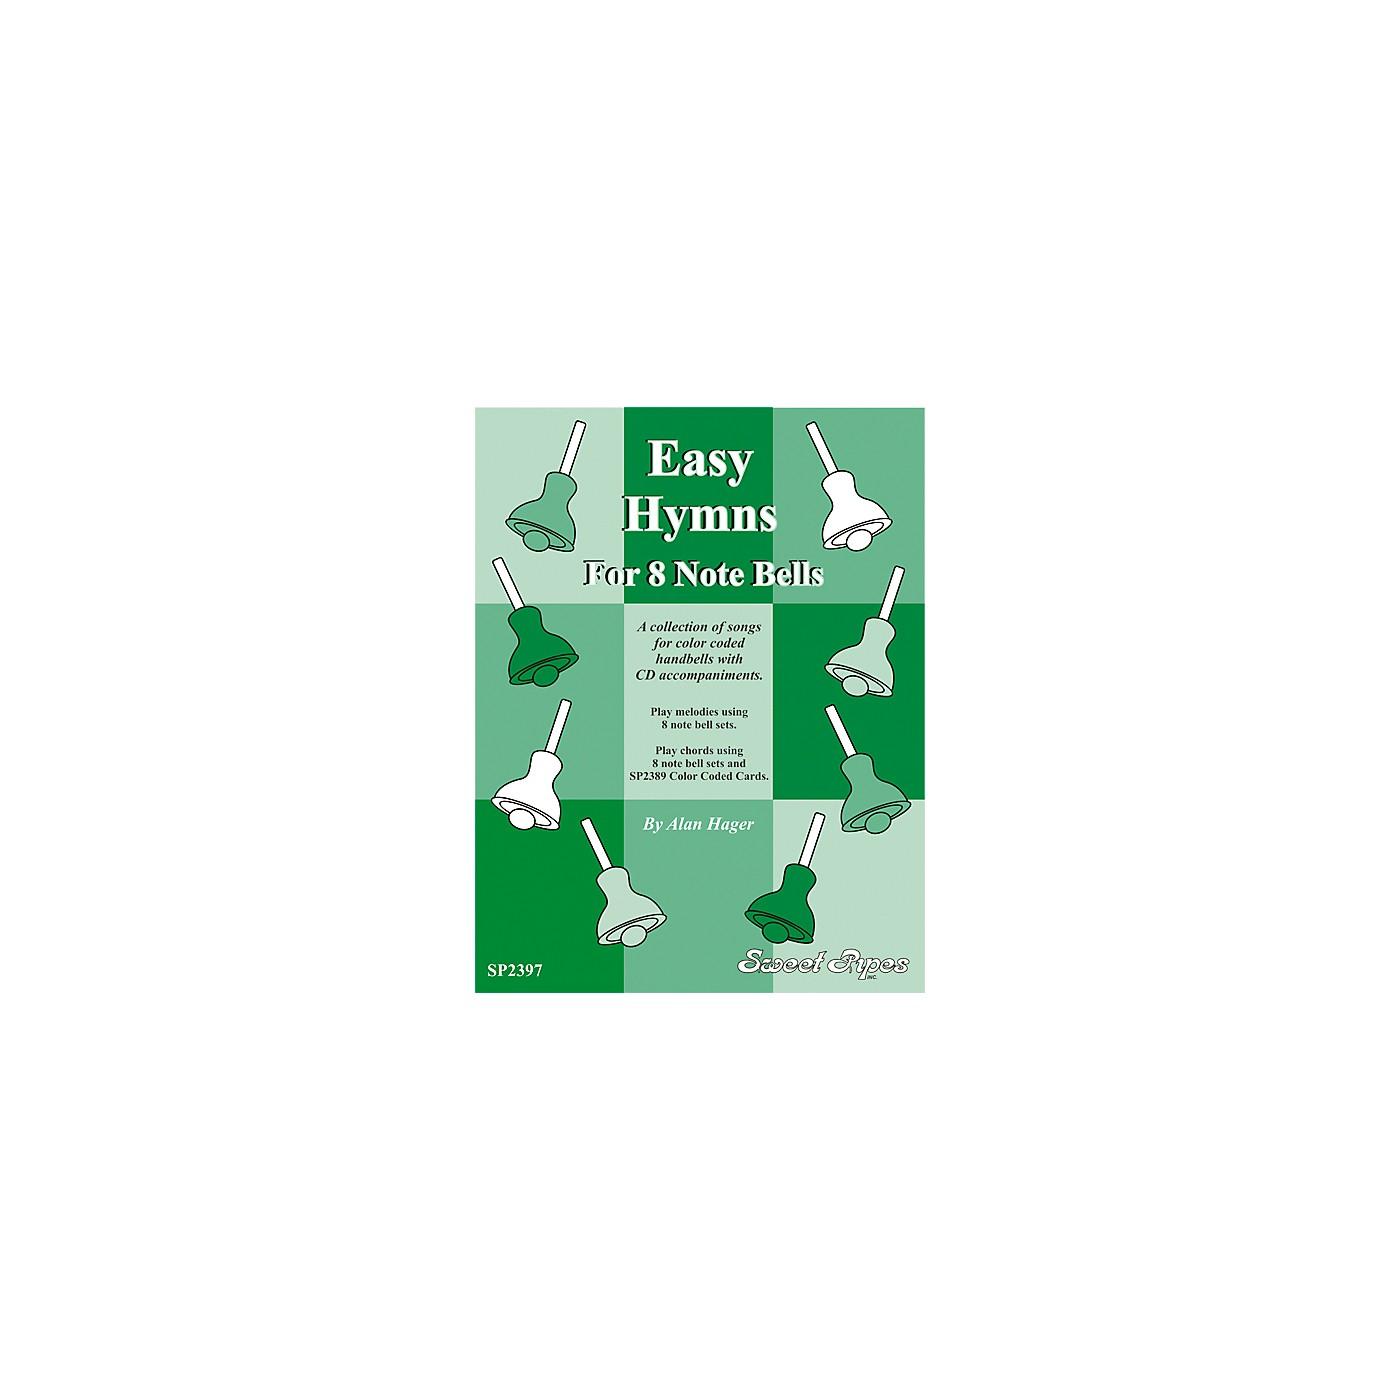 Rhythm Band Easy Hymns - 12 Hymns for 8 Note Handbells & Deskbells Book with CD thumbnail